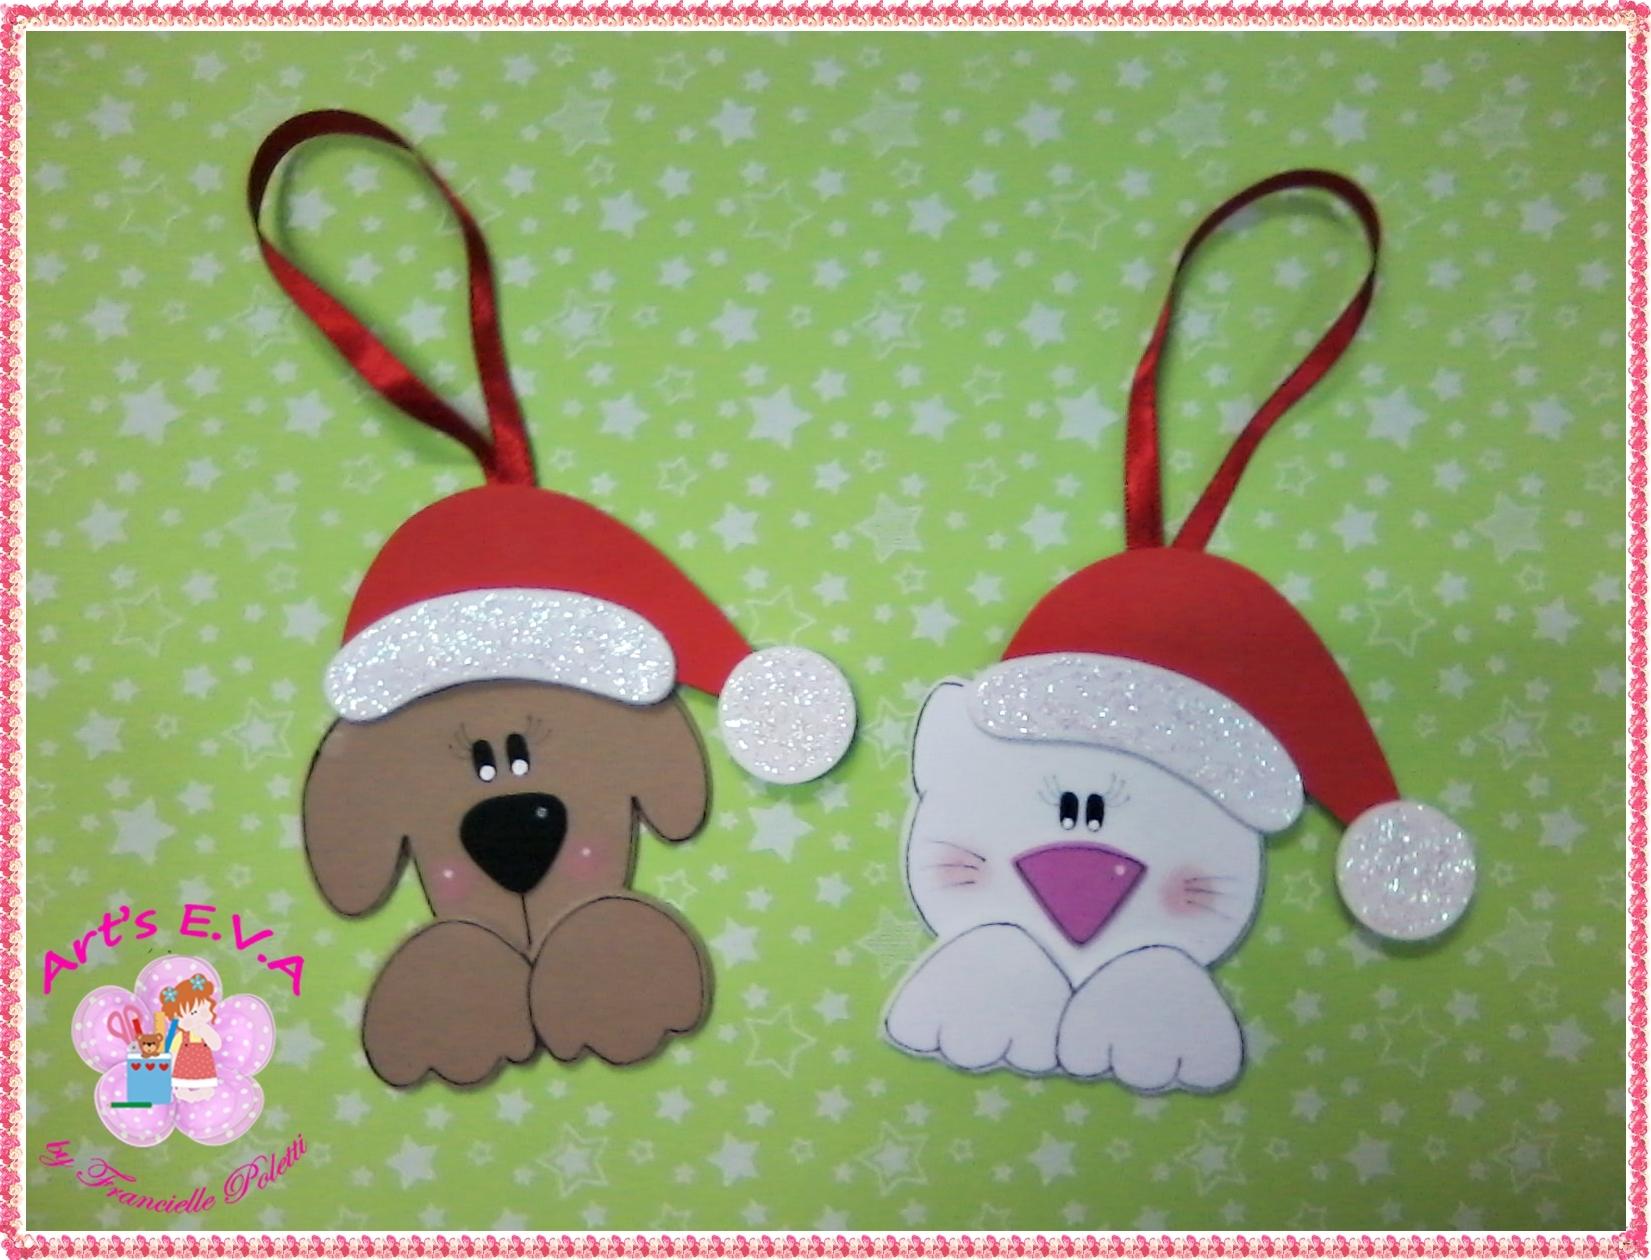 Enfeite De Eva ~ Enfeites Natal animais Arts E V A Elo7